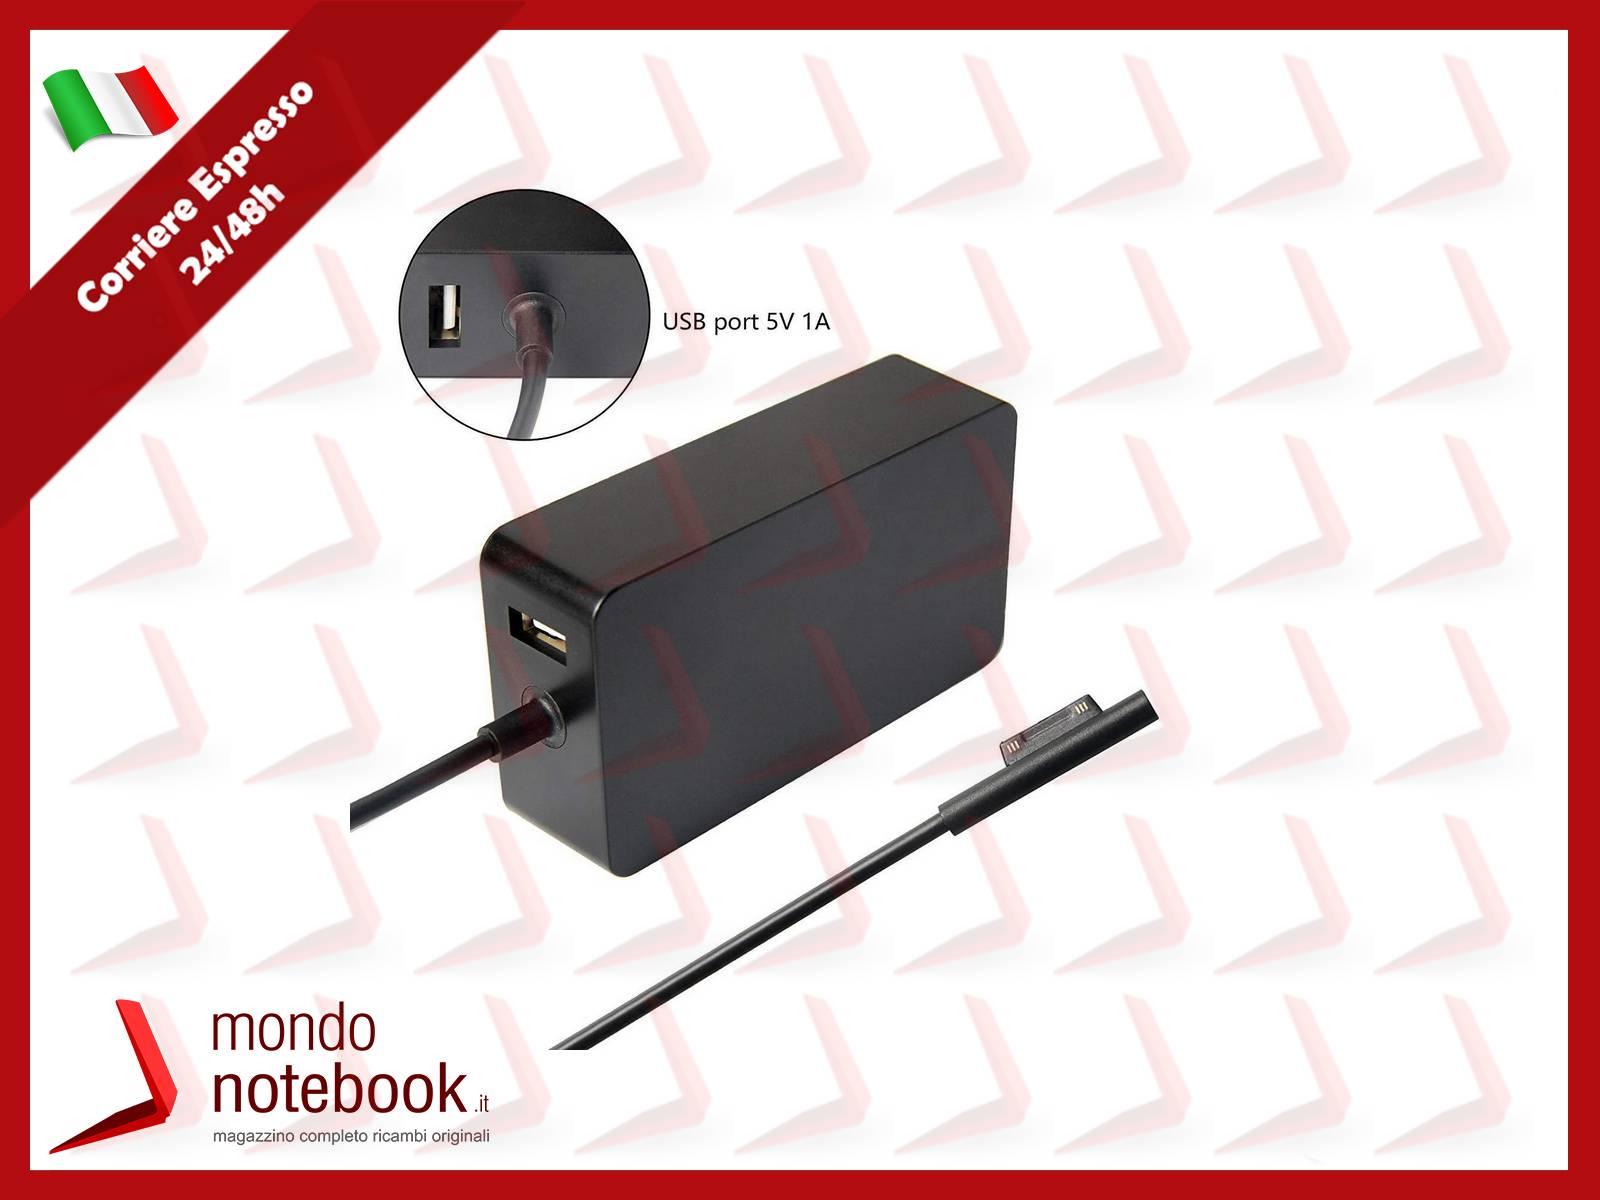 https://www.mondonotebook.it/12152/green-cell-tablet-batteria-a1445-apple-ipad-mini-a1432-a1454-a1455.jpg